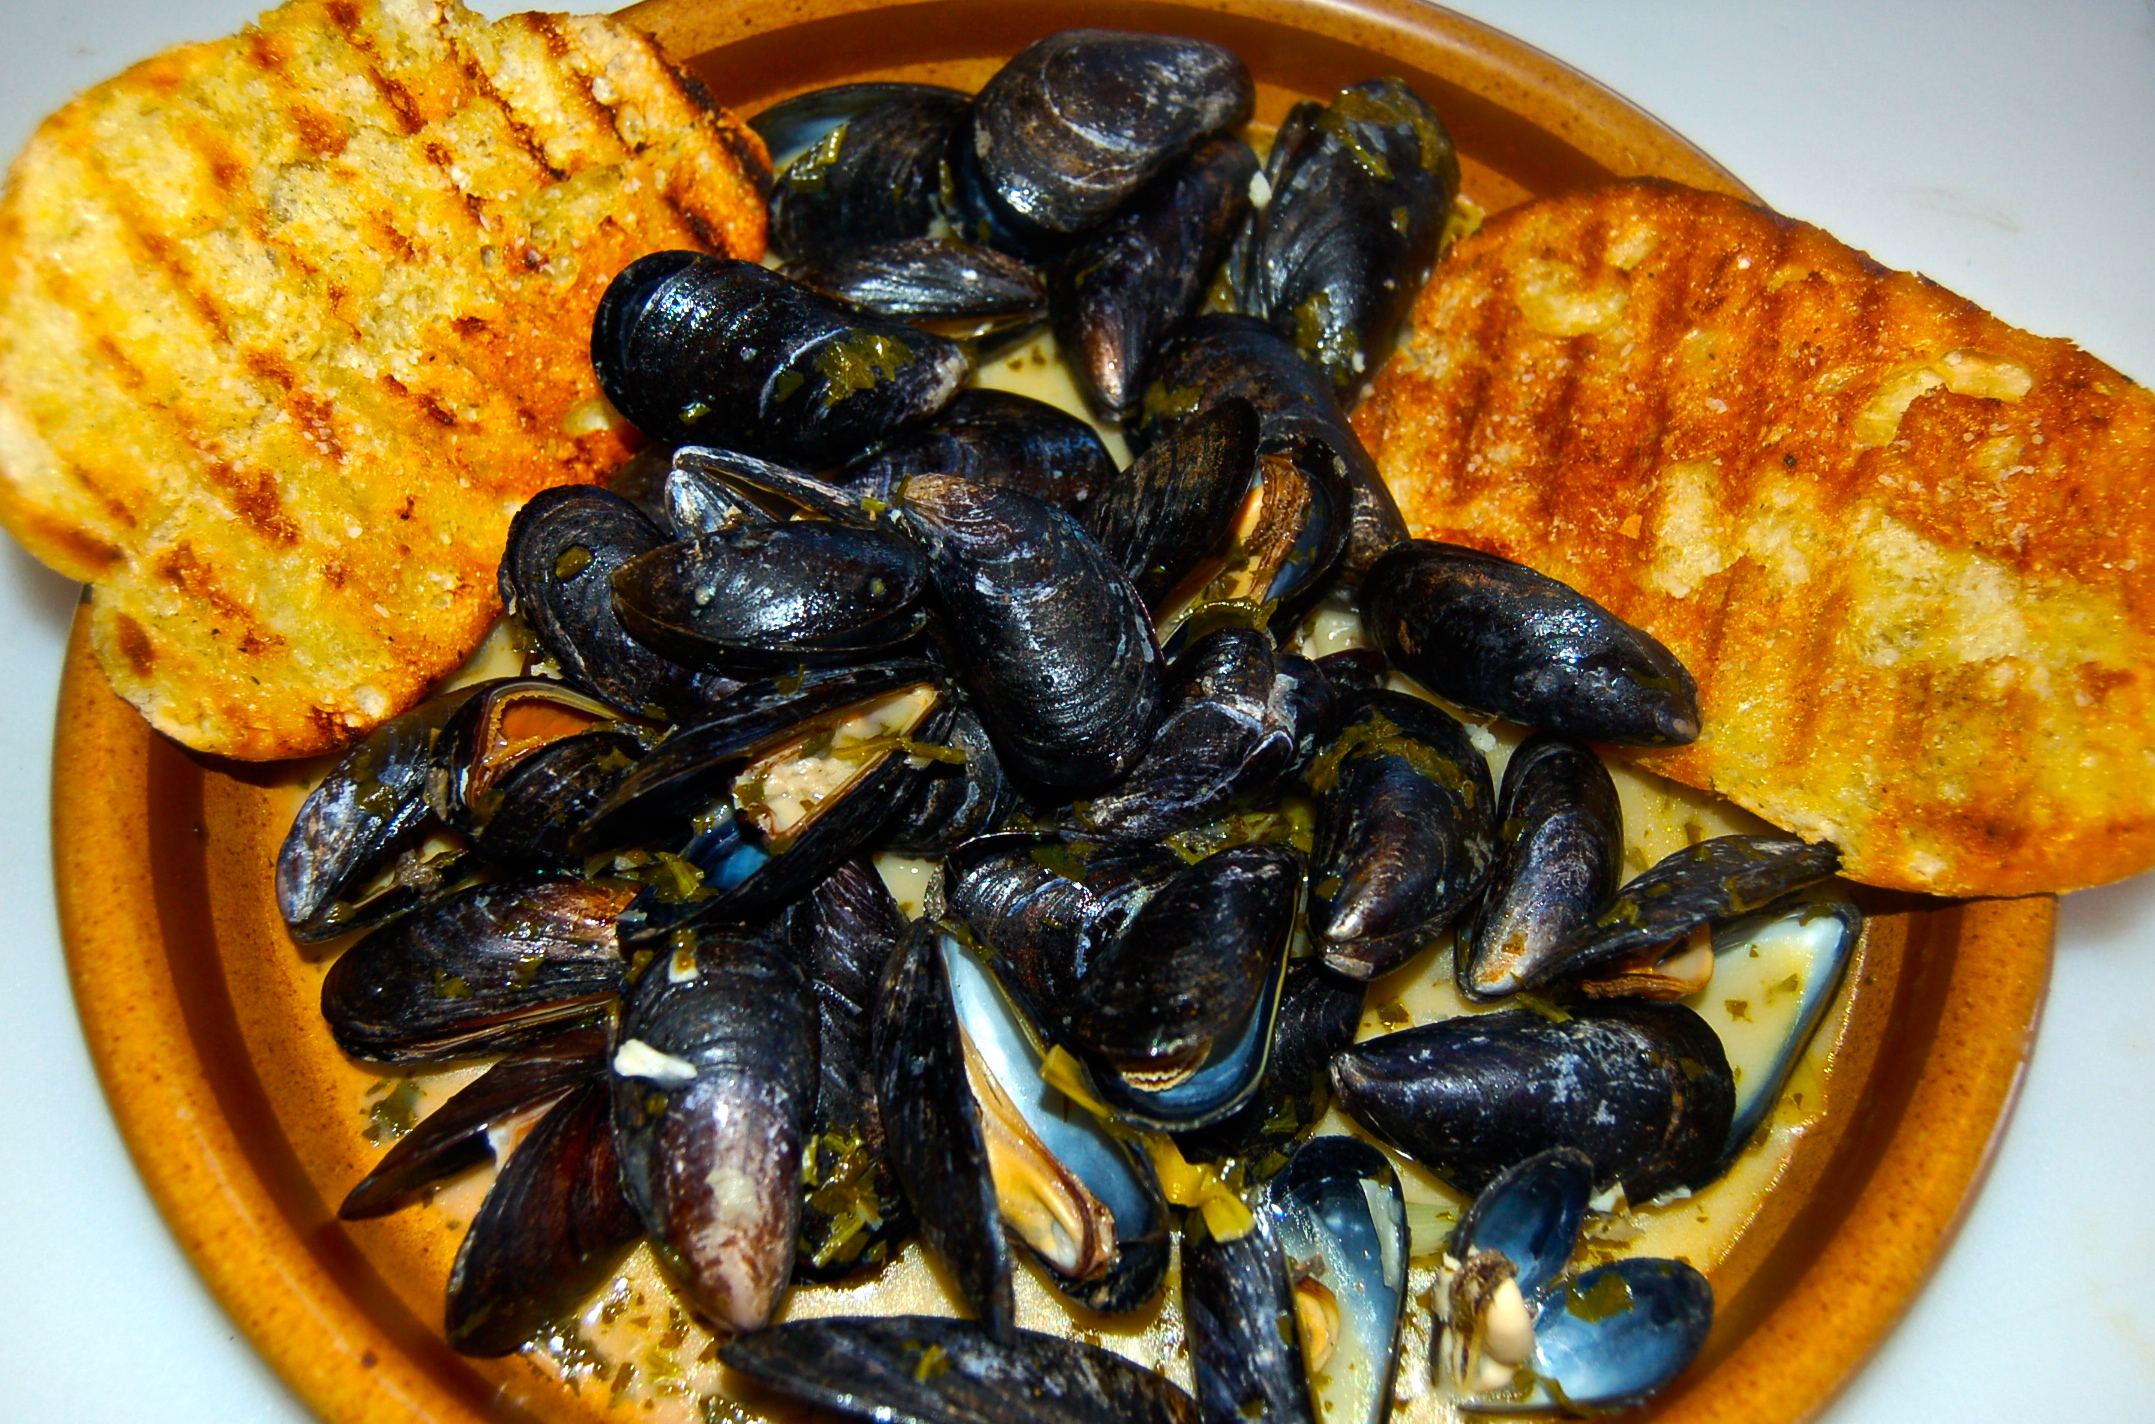 June 22, 2012 Thai Steamed Mussels